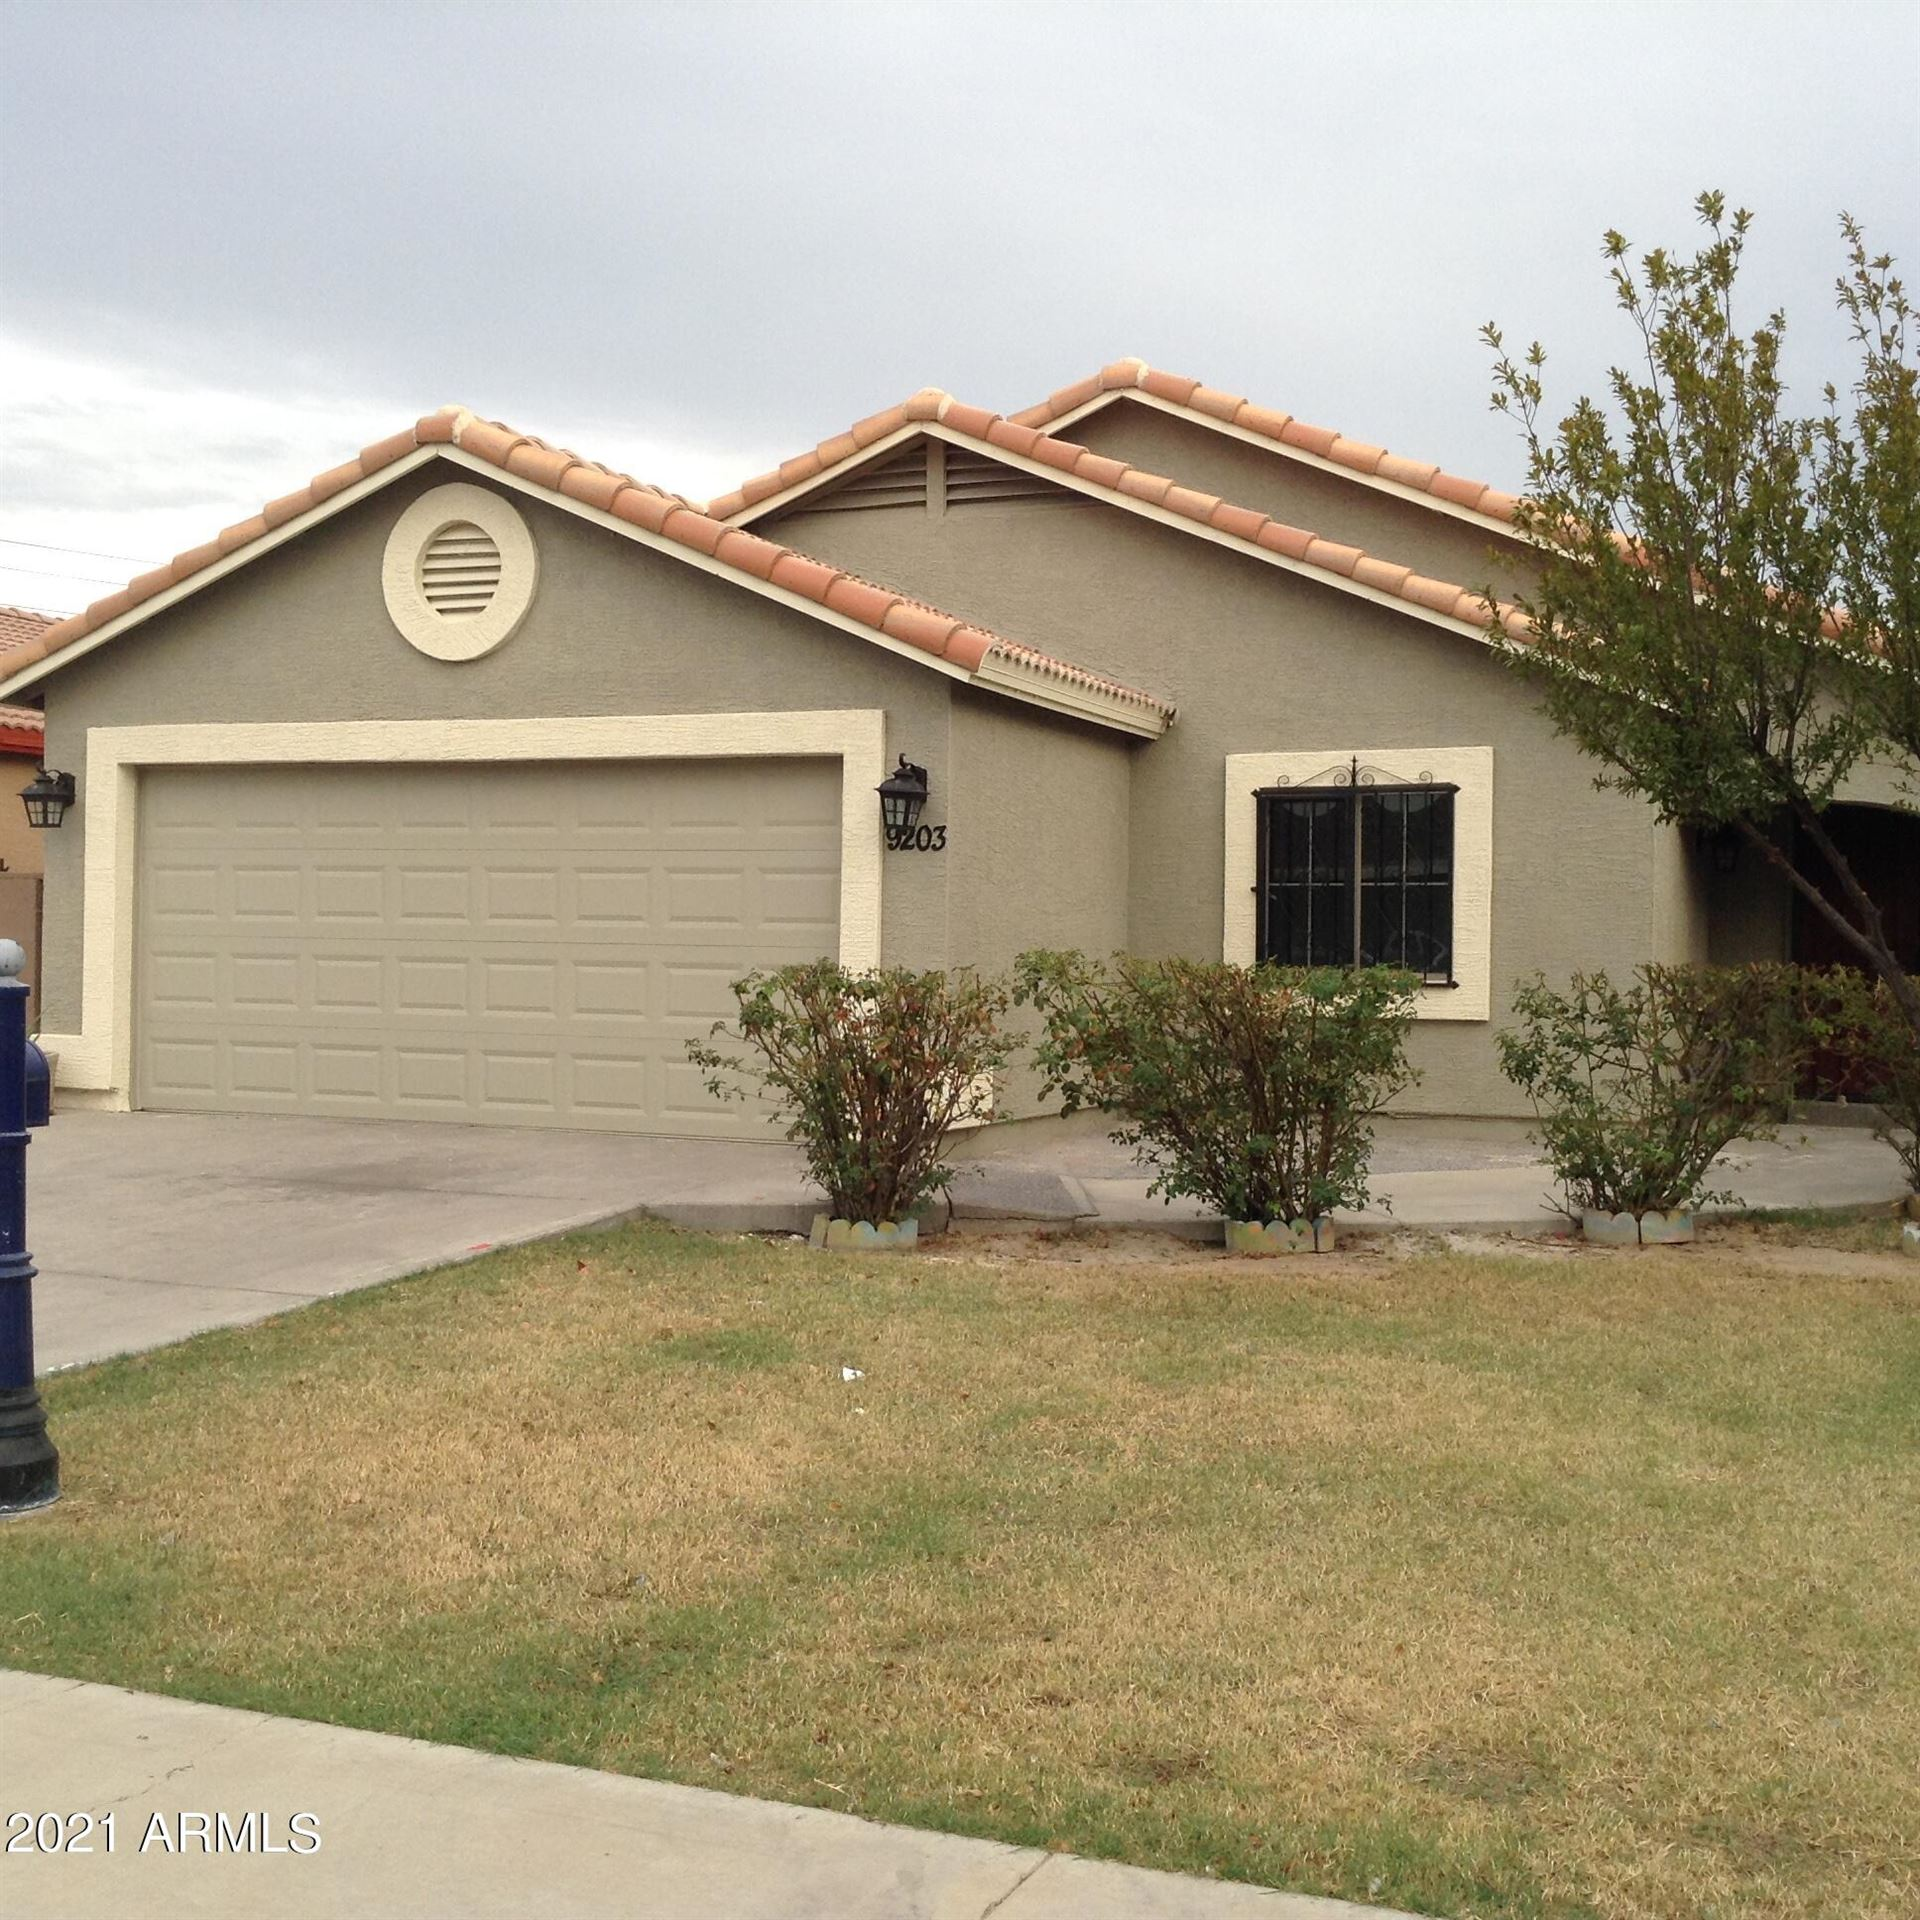 Photo of 9203 W ADAMS Street, Tolleson, AZ 85353 (MLS # 6308214)